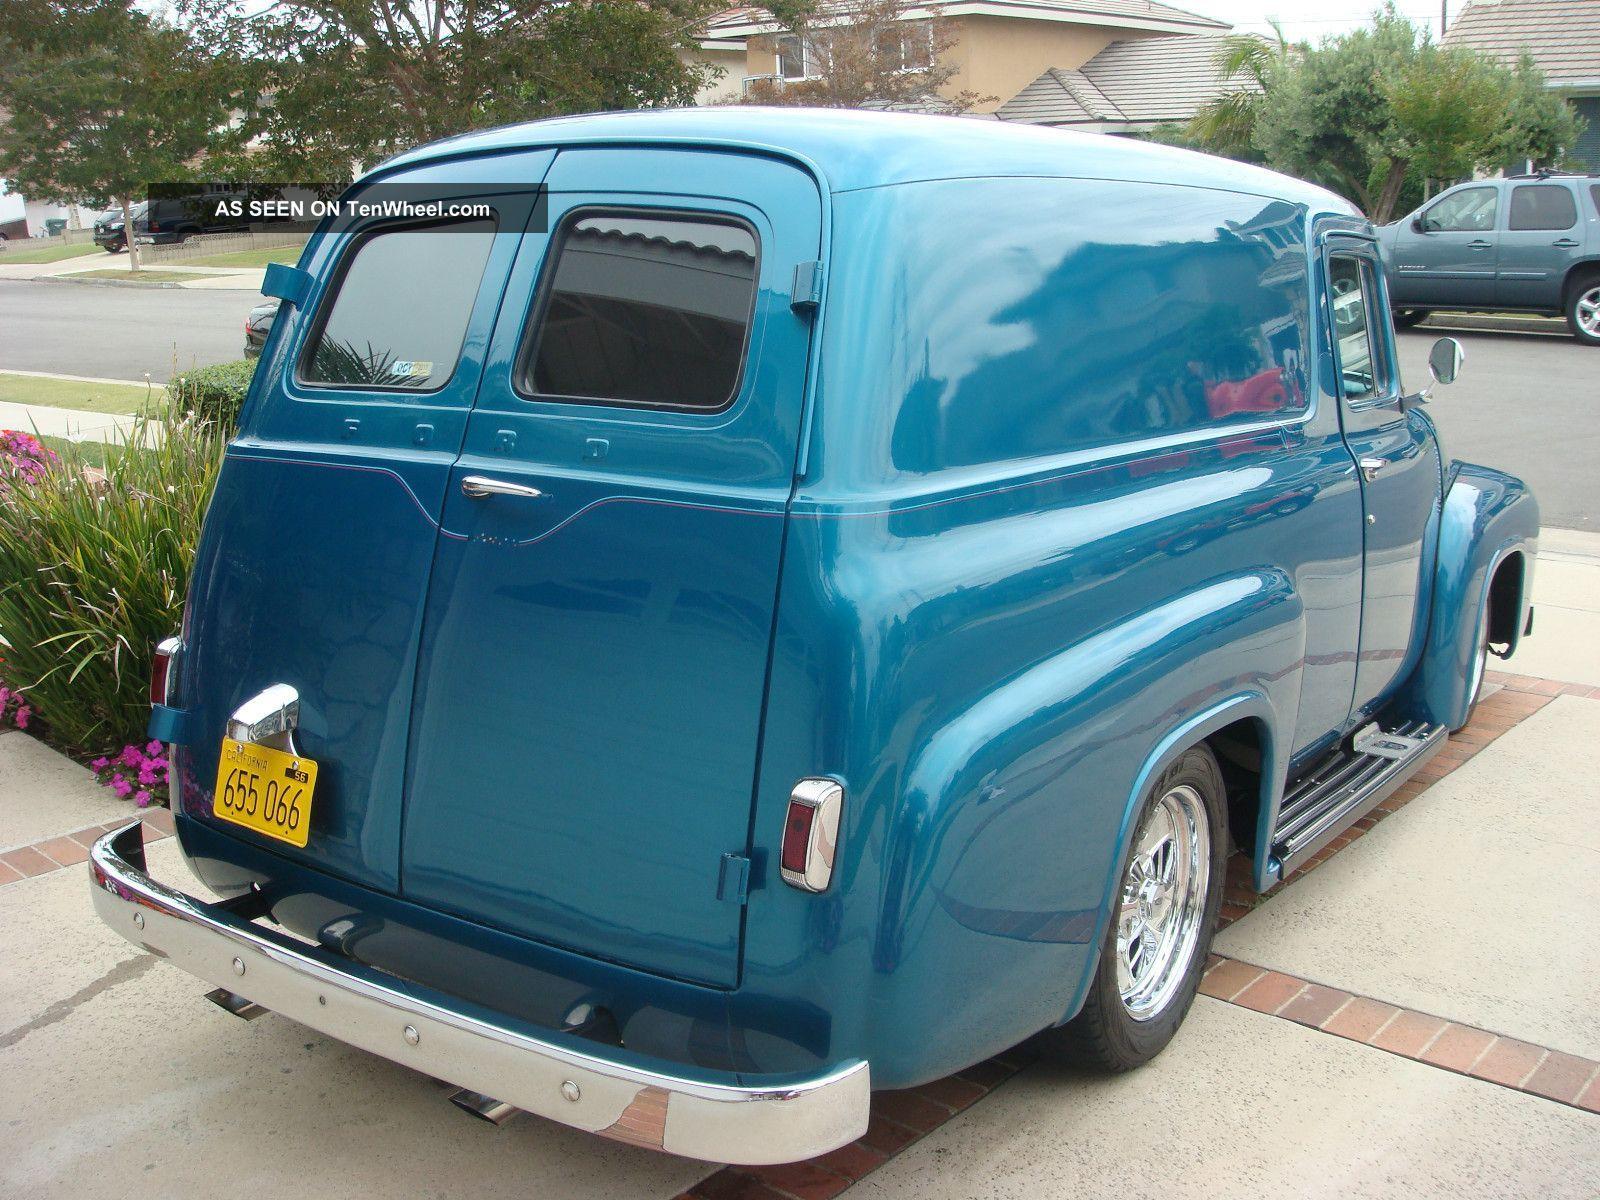 1956 Panel Truck On Craigslist Autos Post